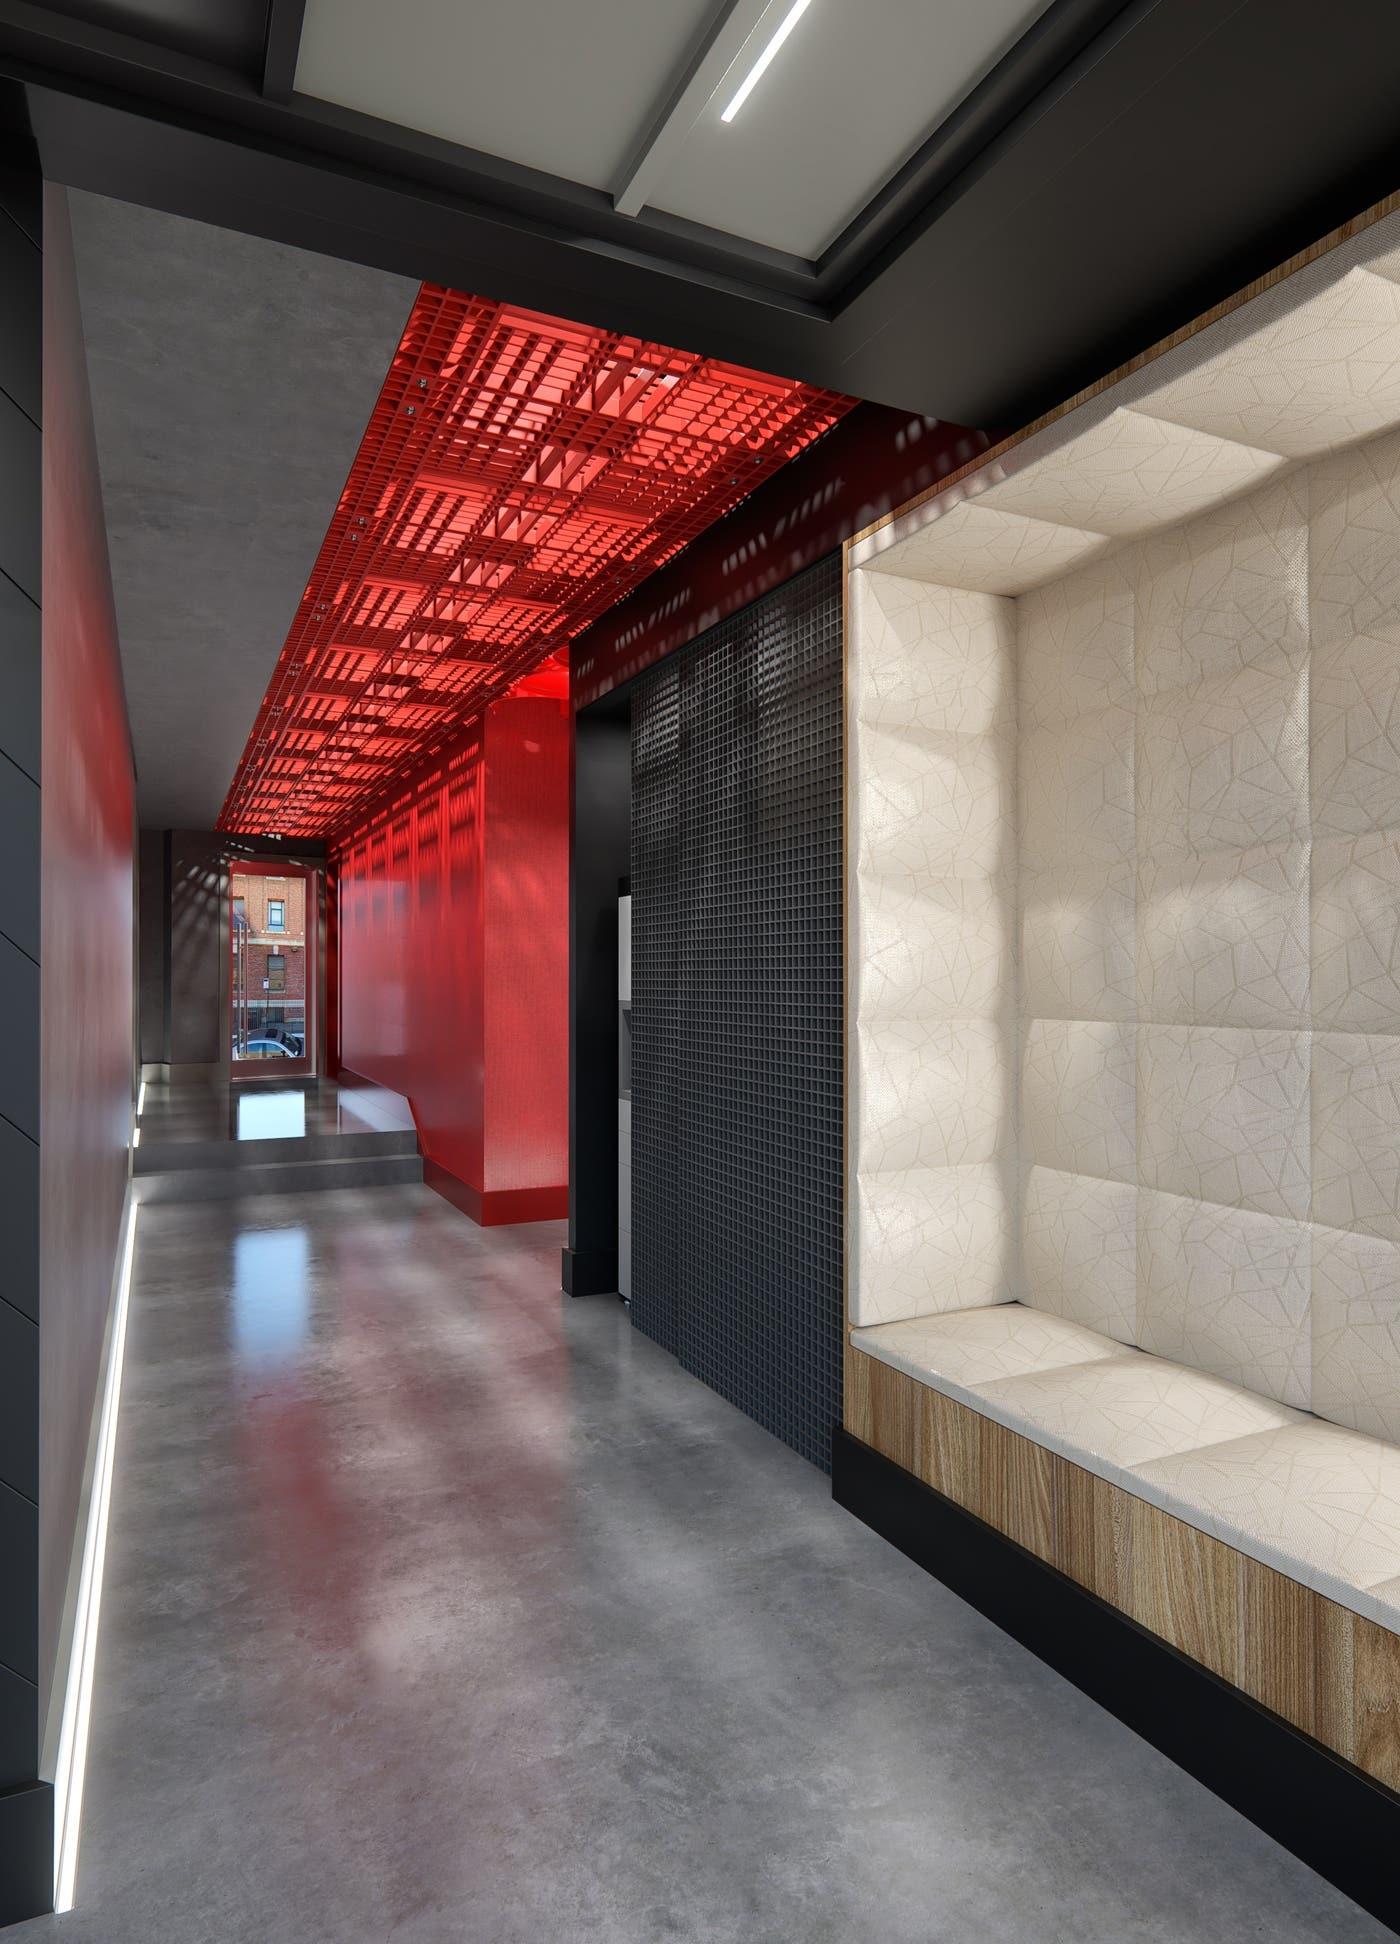 apartment-building-interior-de.jpg